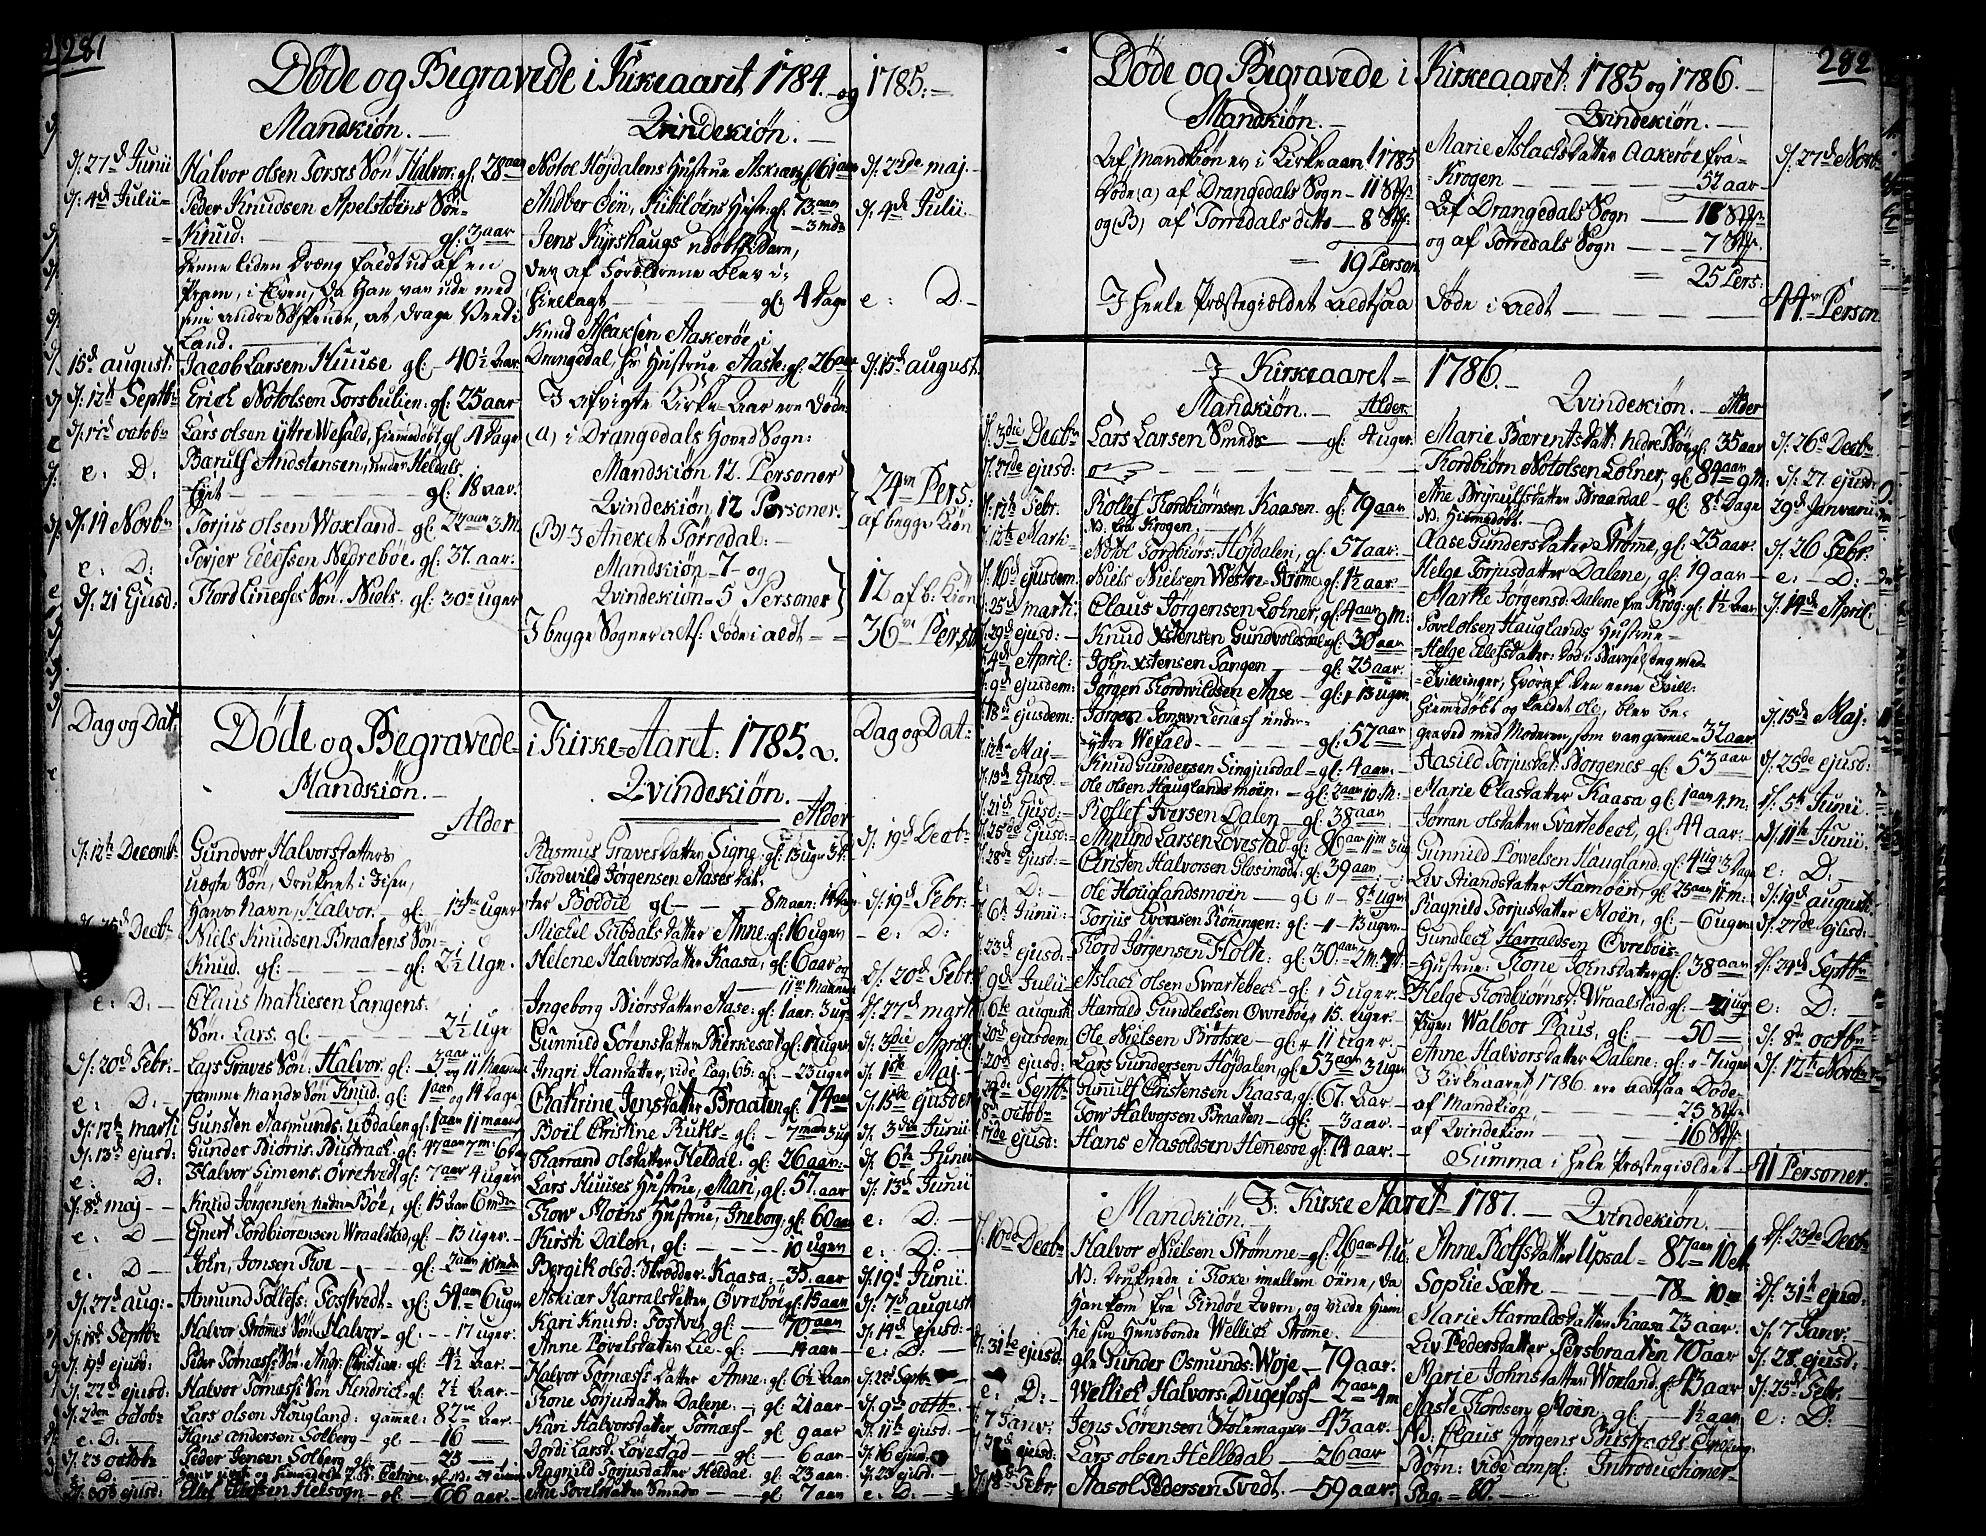 SAKO, Drangedal kirkebøker, F/Fa/L0003: Ministerialbok nr. 3, 1768-1814, s. 281-282